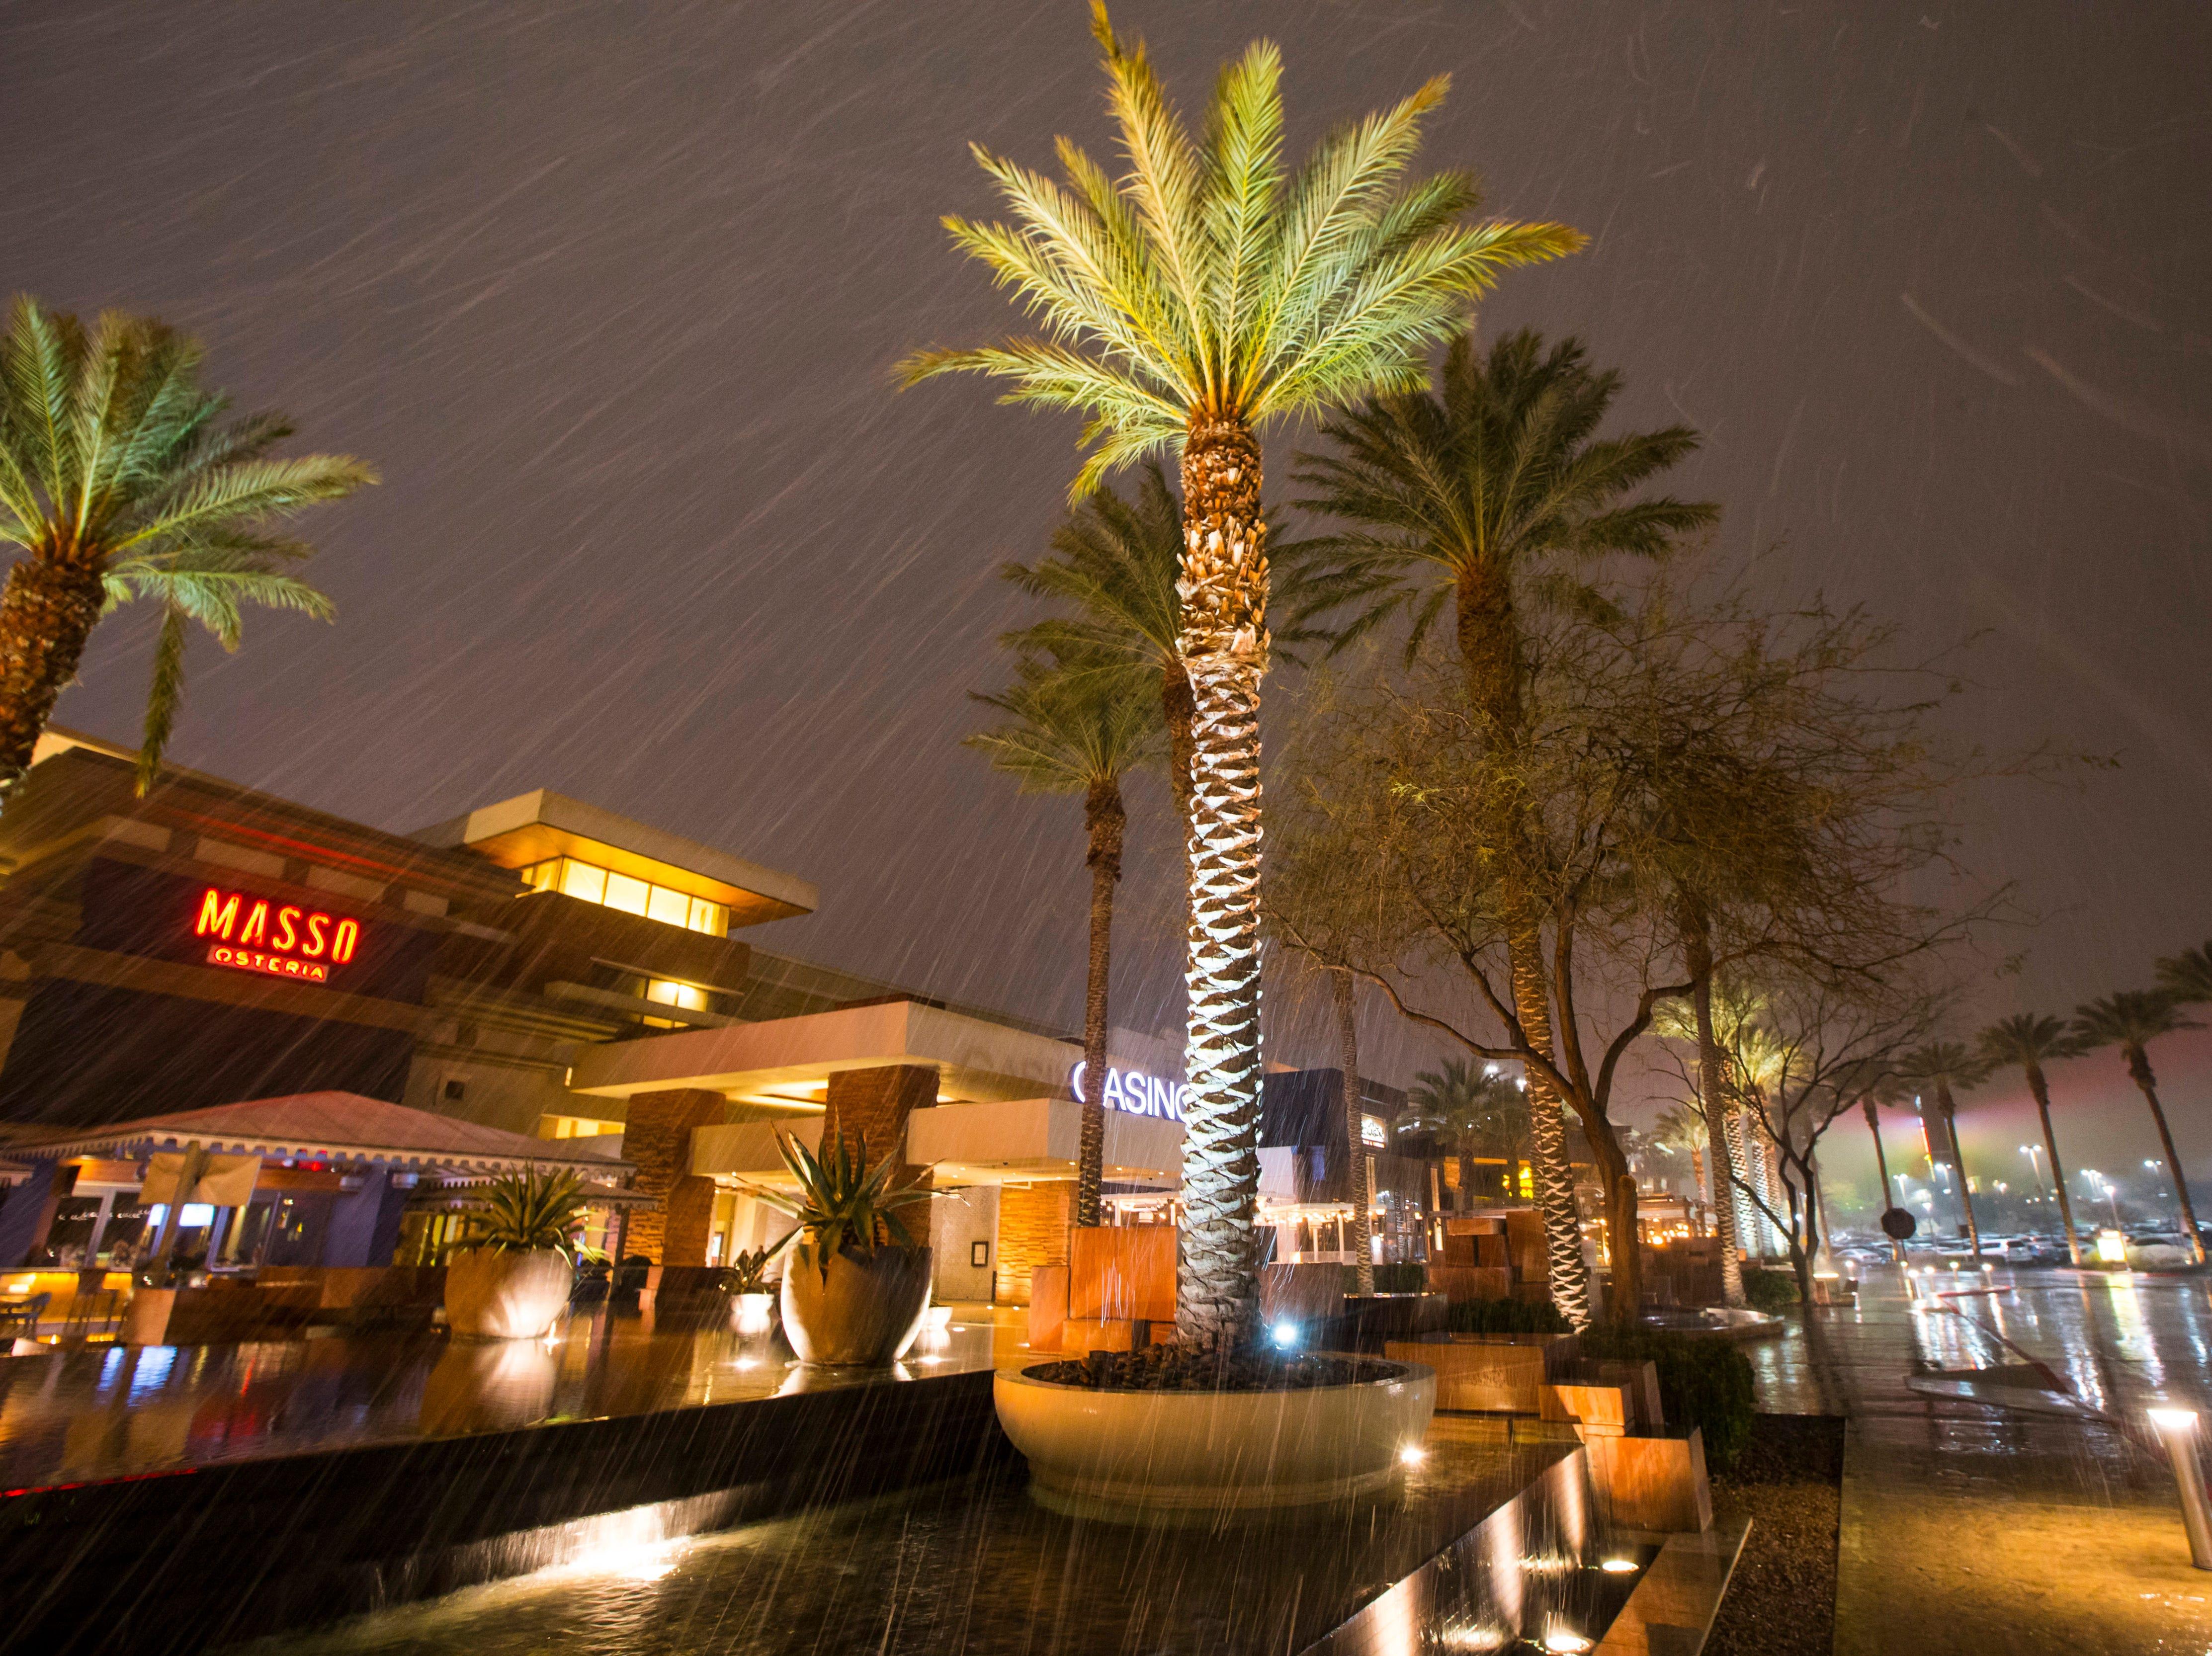 Snow falls outside of Red Rock Resort in Las Vegas on Wednesday, Feb. 20, 2019. (Chase Stevens/Las Vegas Review-Journal via AP)